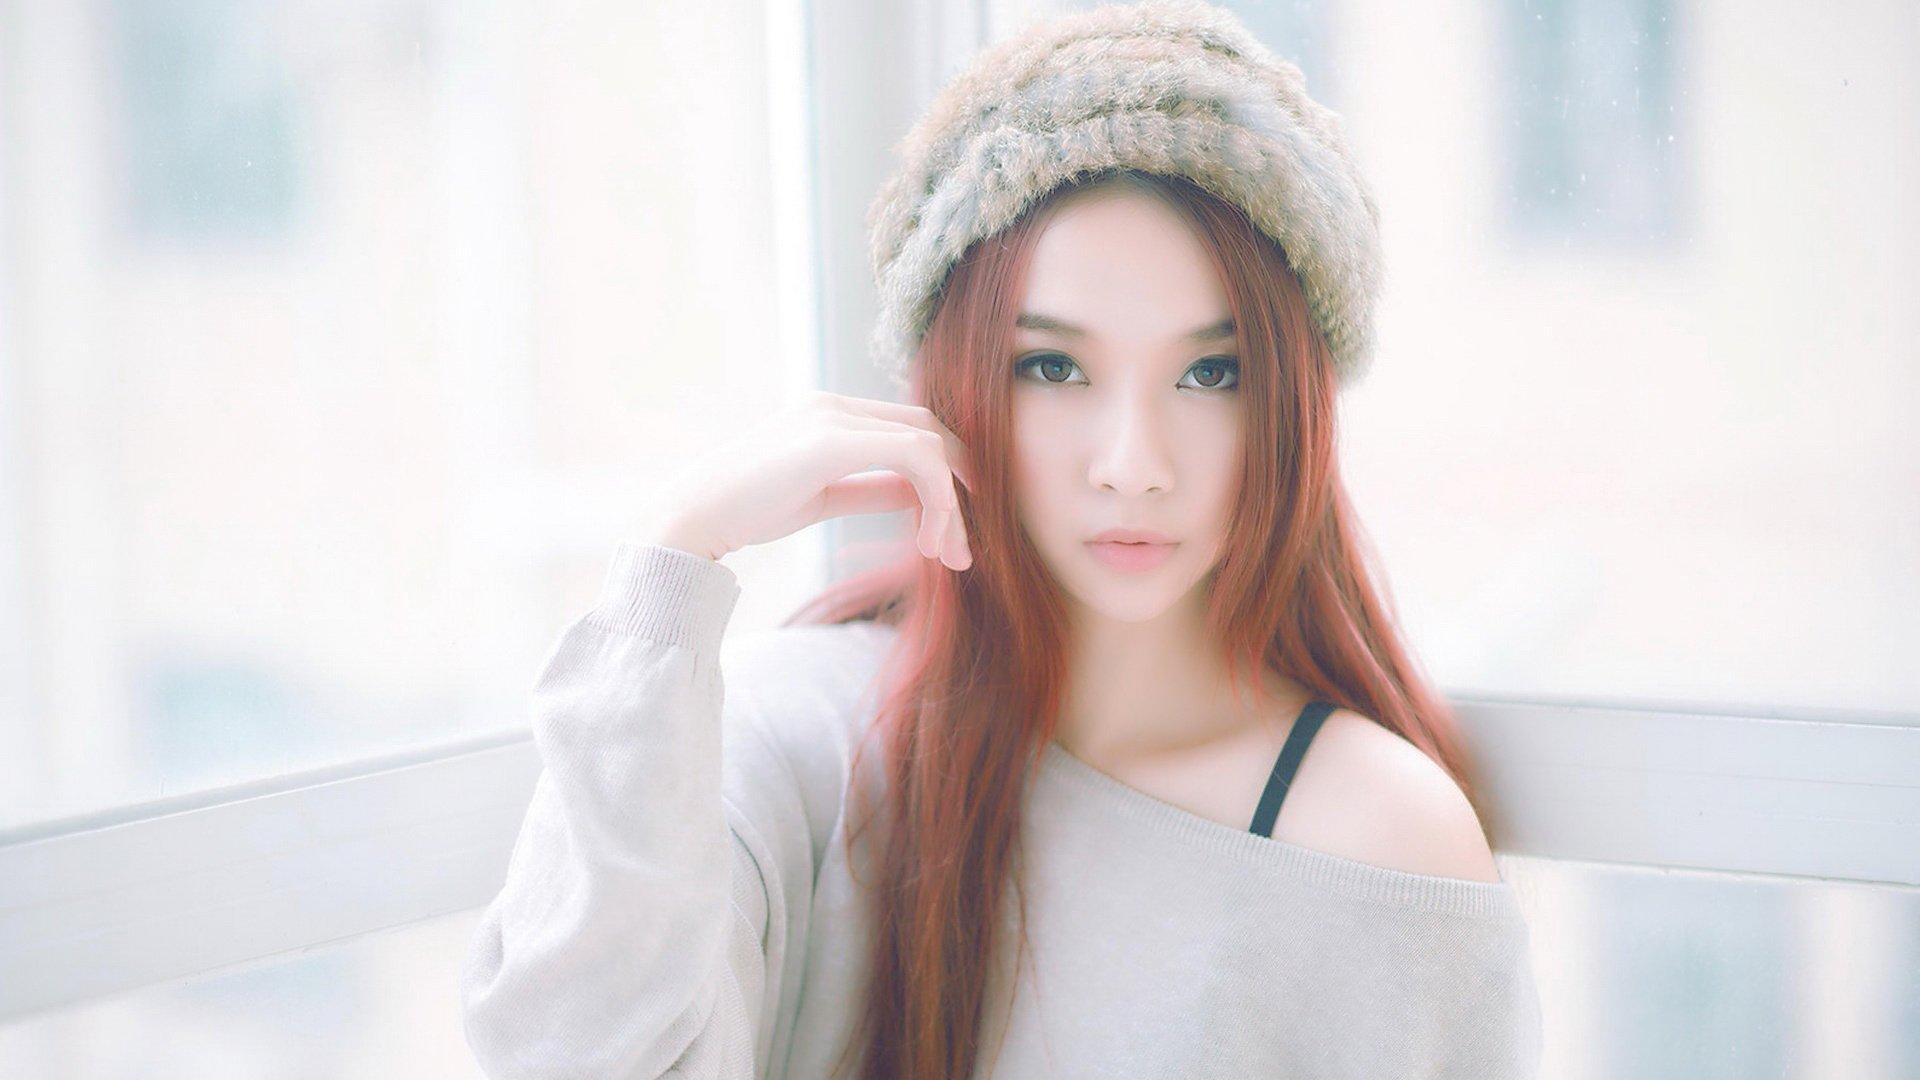 android安卓美女 清纯 可爱 长发 清新 居家 摄影  萌